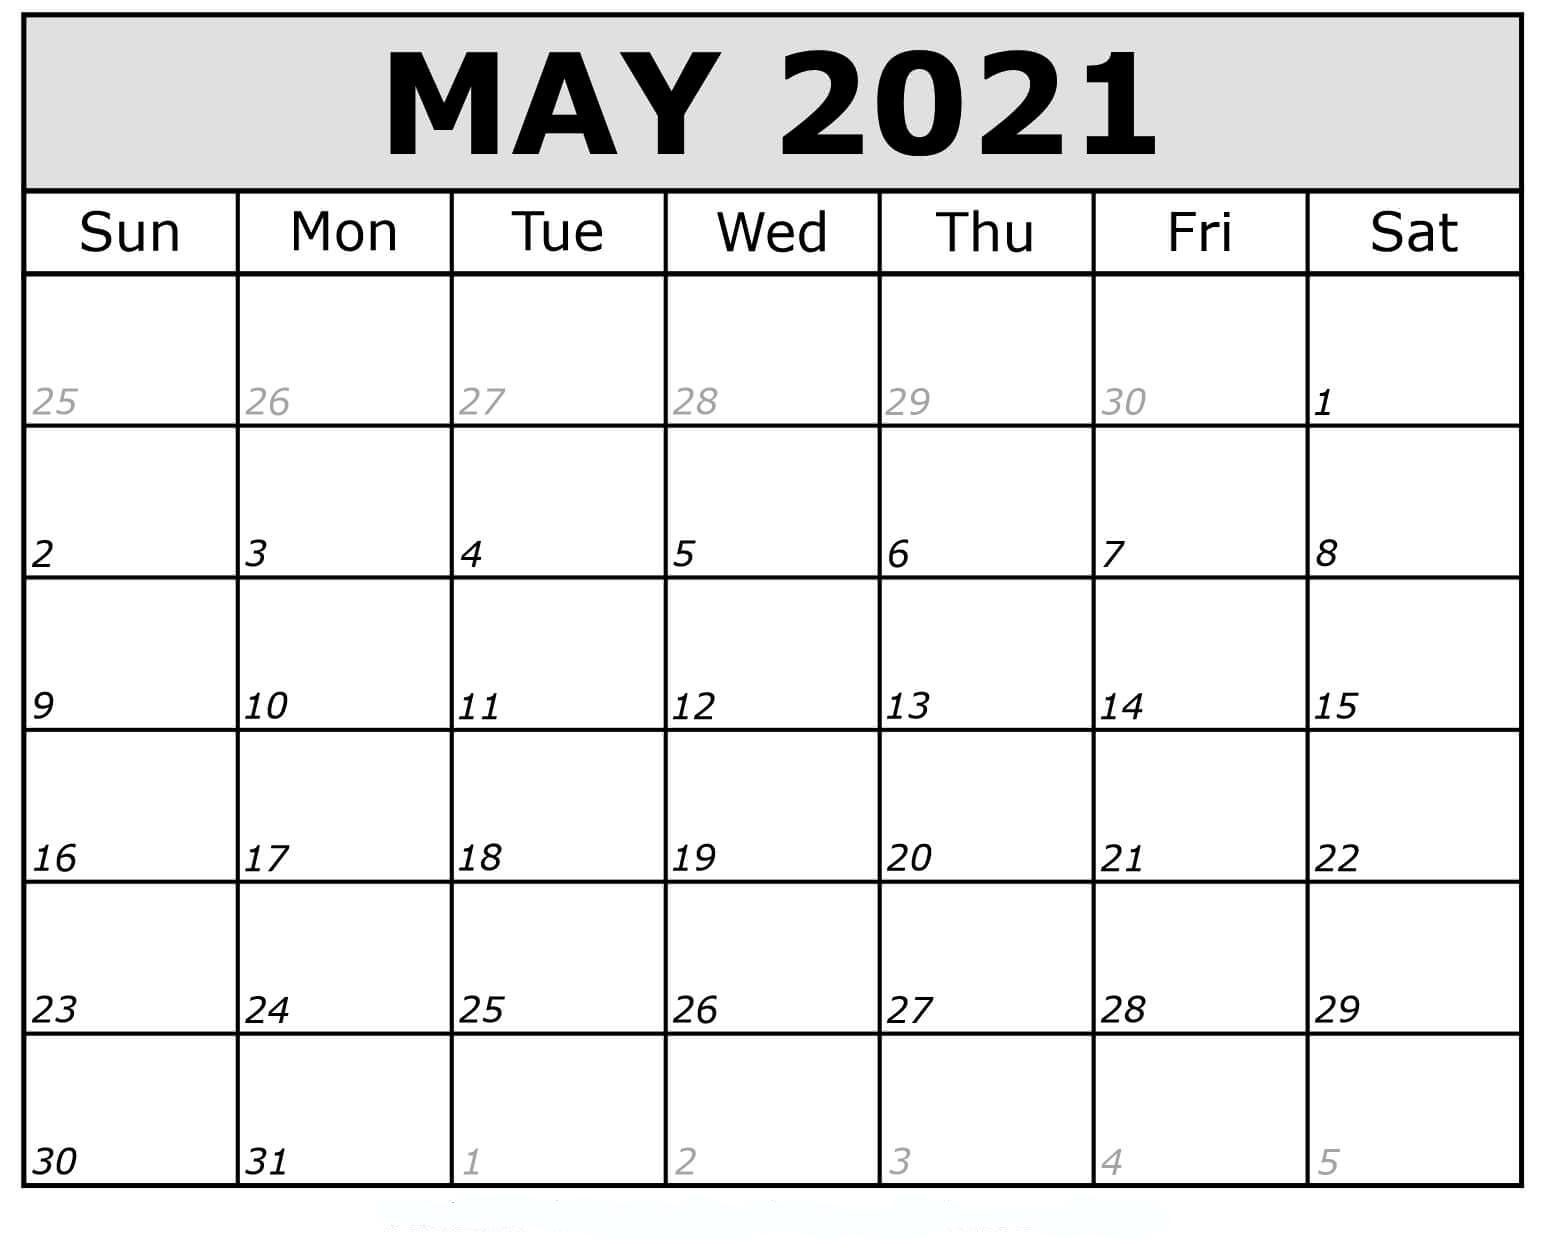 May 2021 Calendar Printable Pdf - Mycalendarlabs